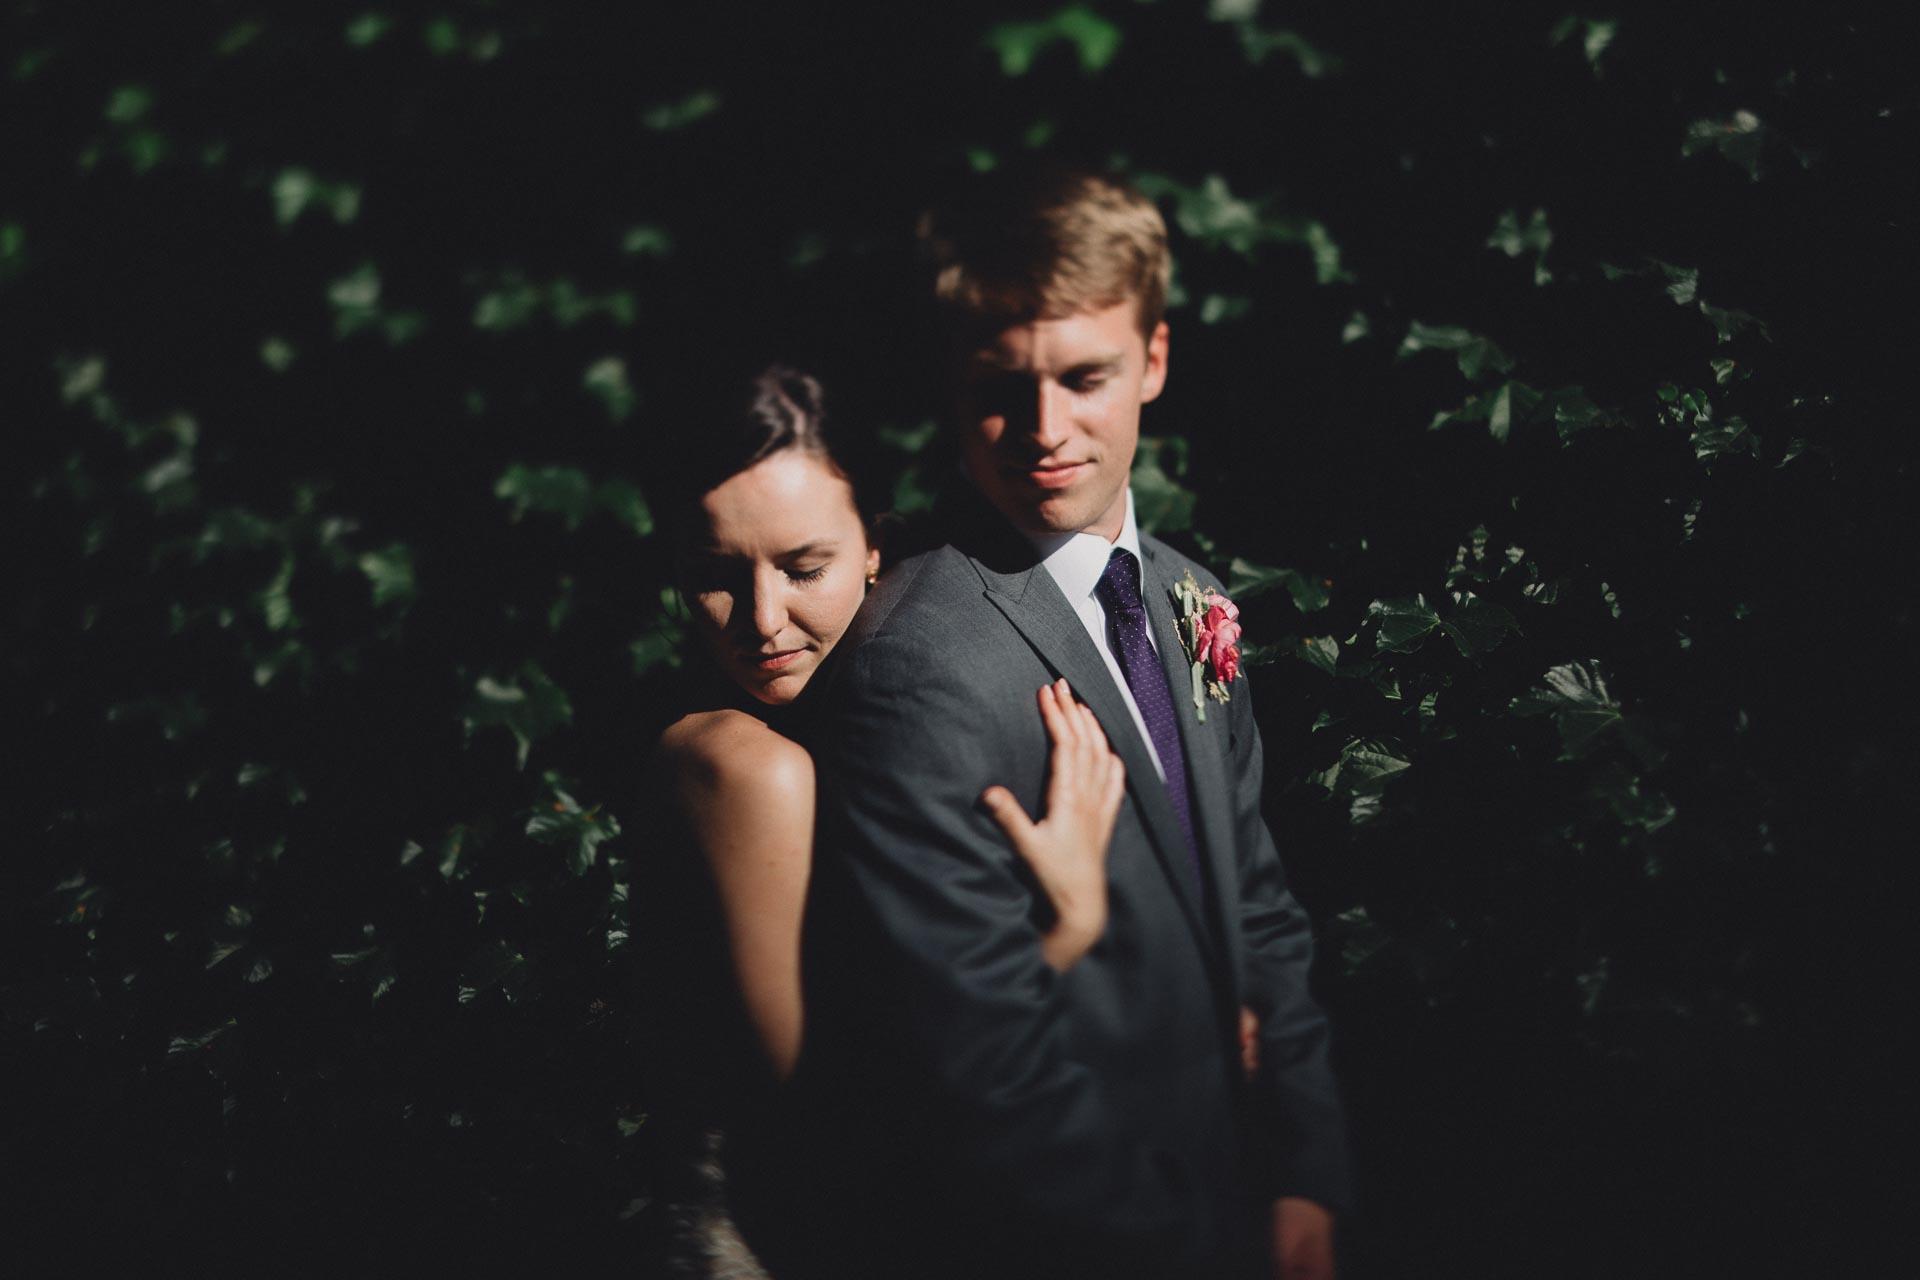 Julia-Michael-Cincinnati-Music-Hall-Wedding-119@2x.jpg